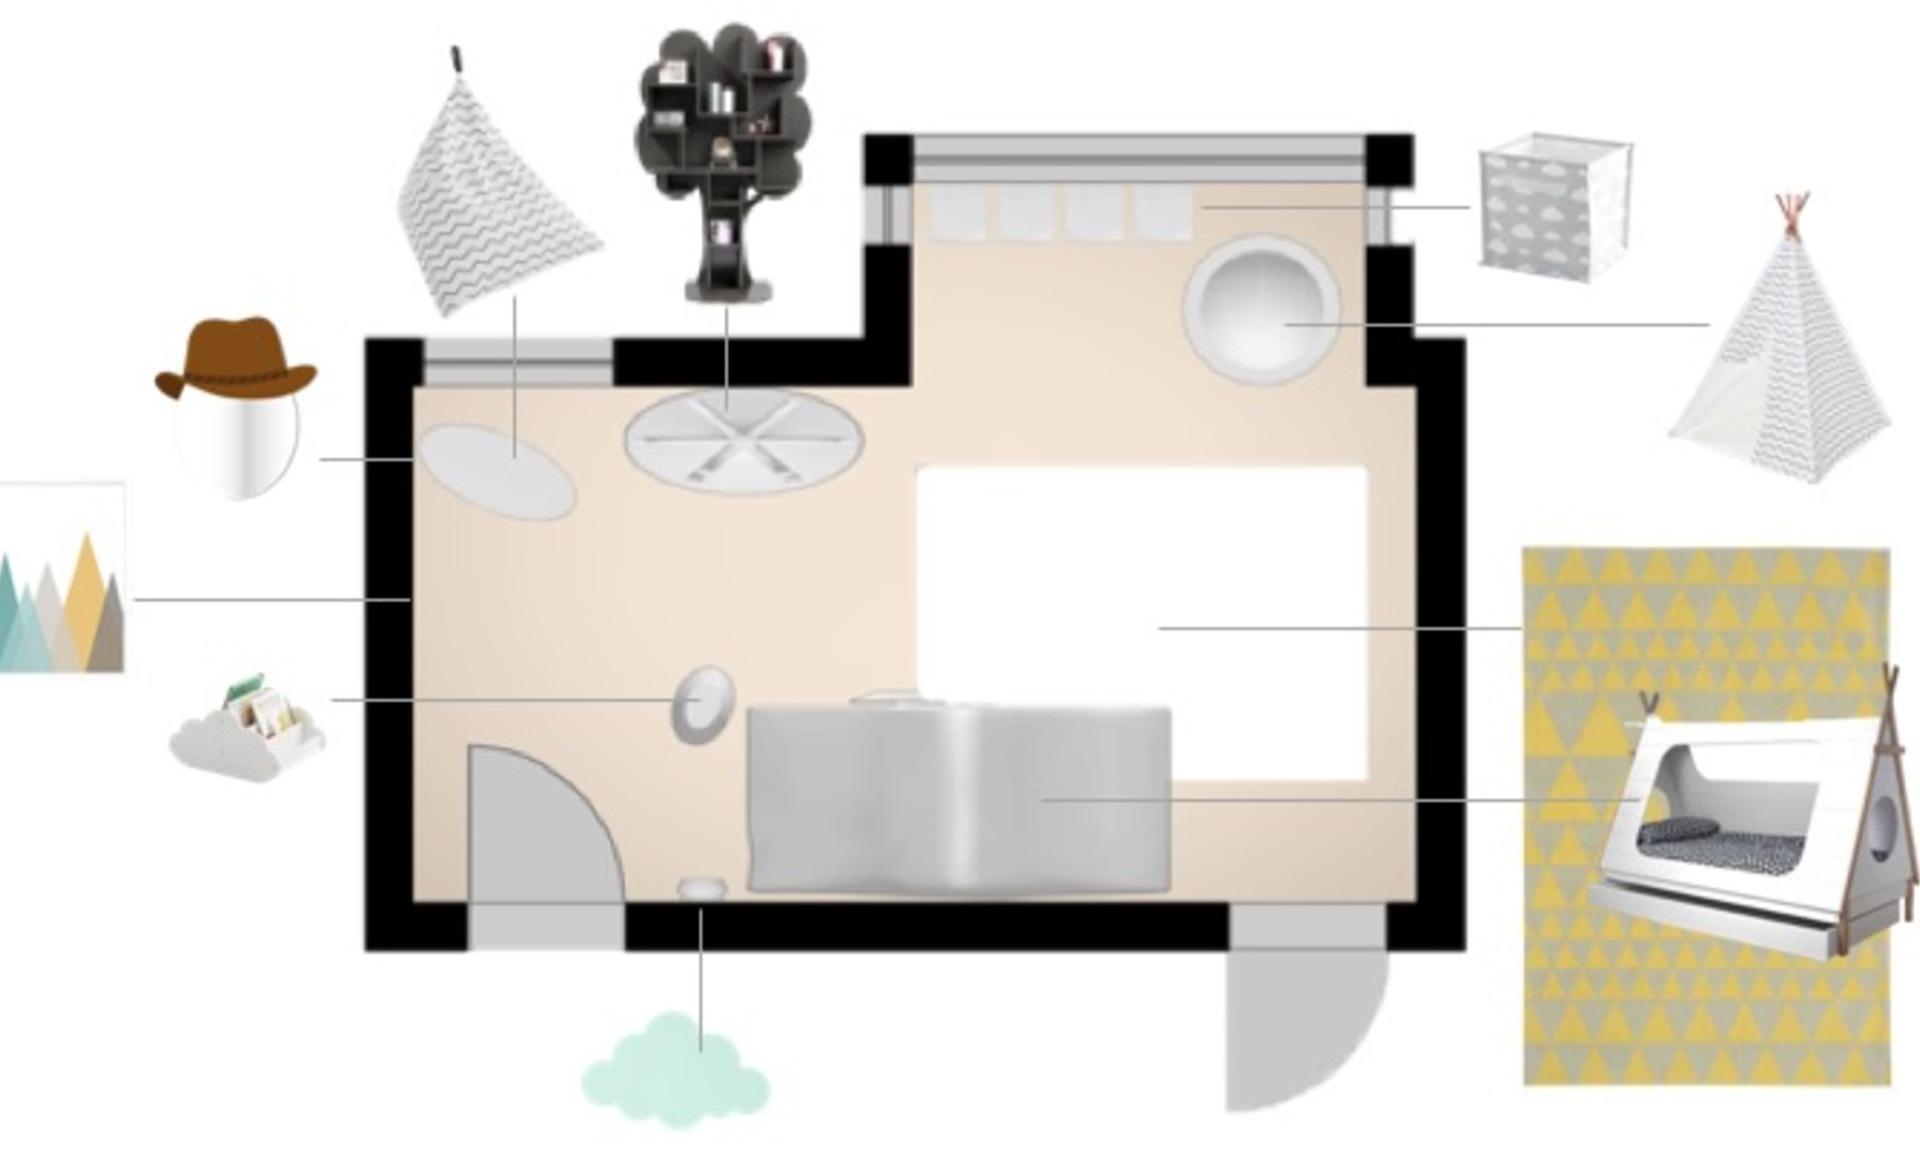 Mbr carolhanda toddlerbedroom floorplan